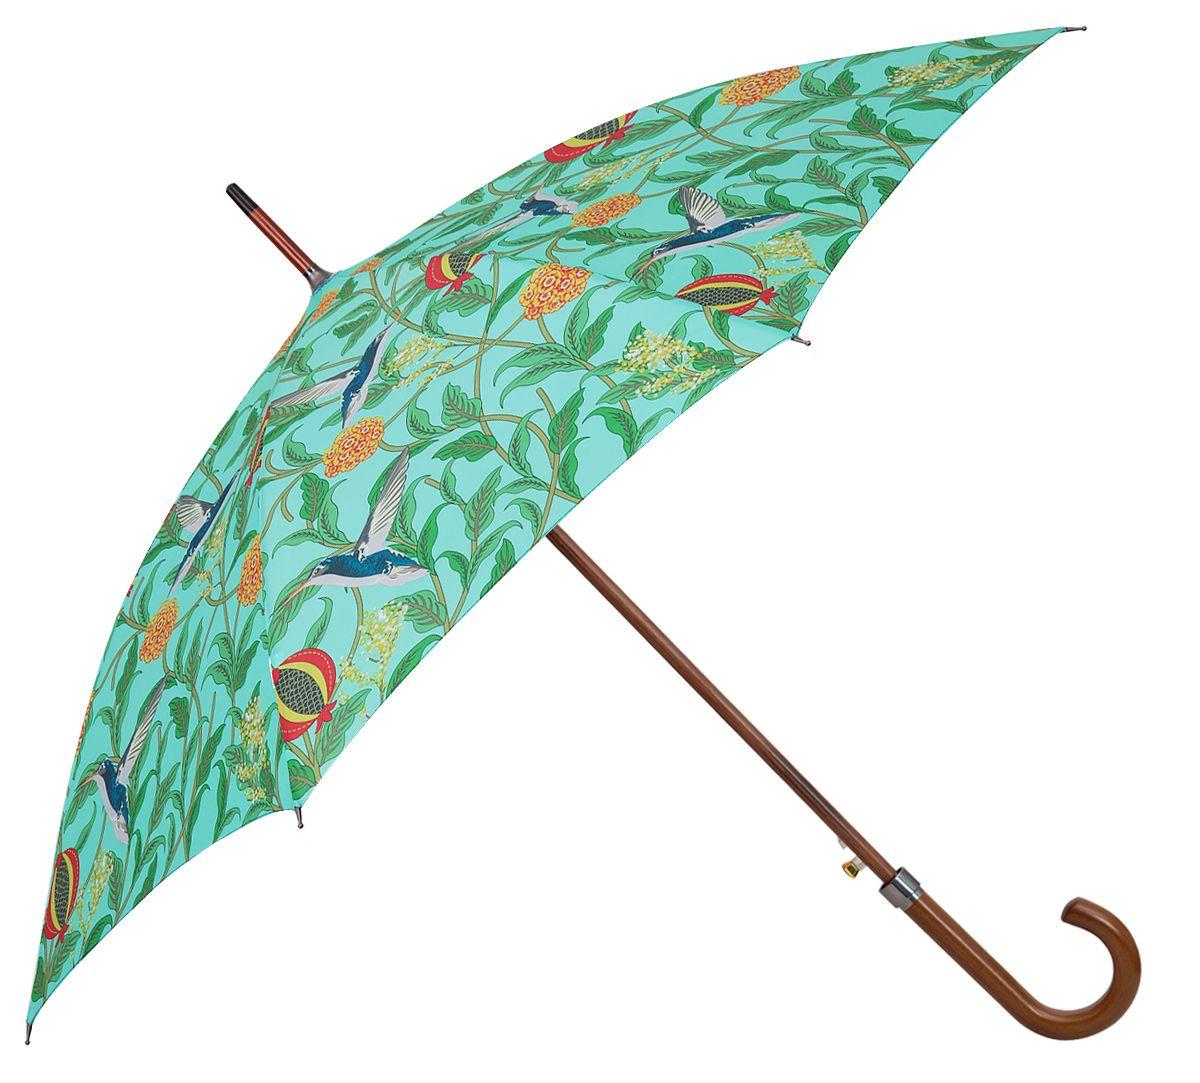 Fashionable Umbrellas